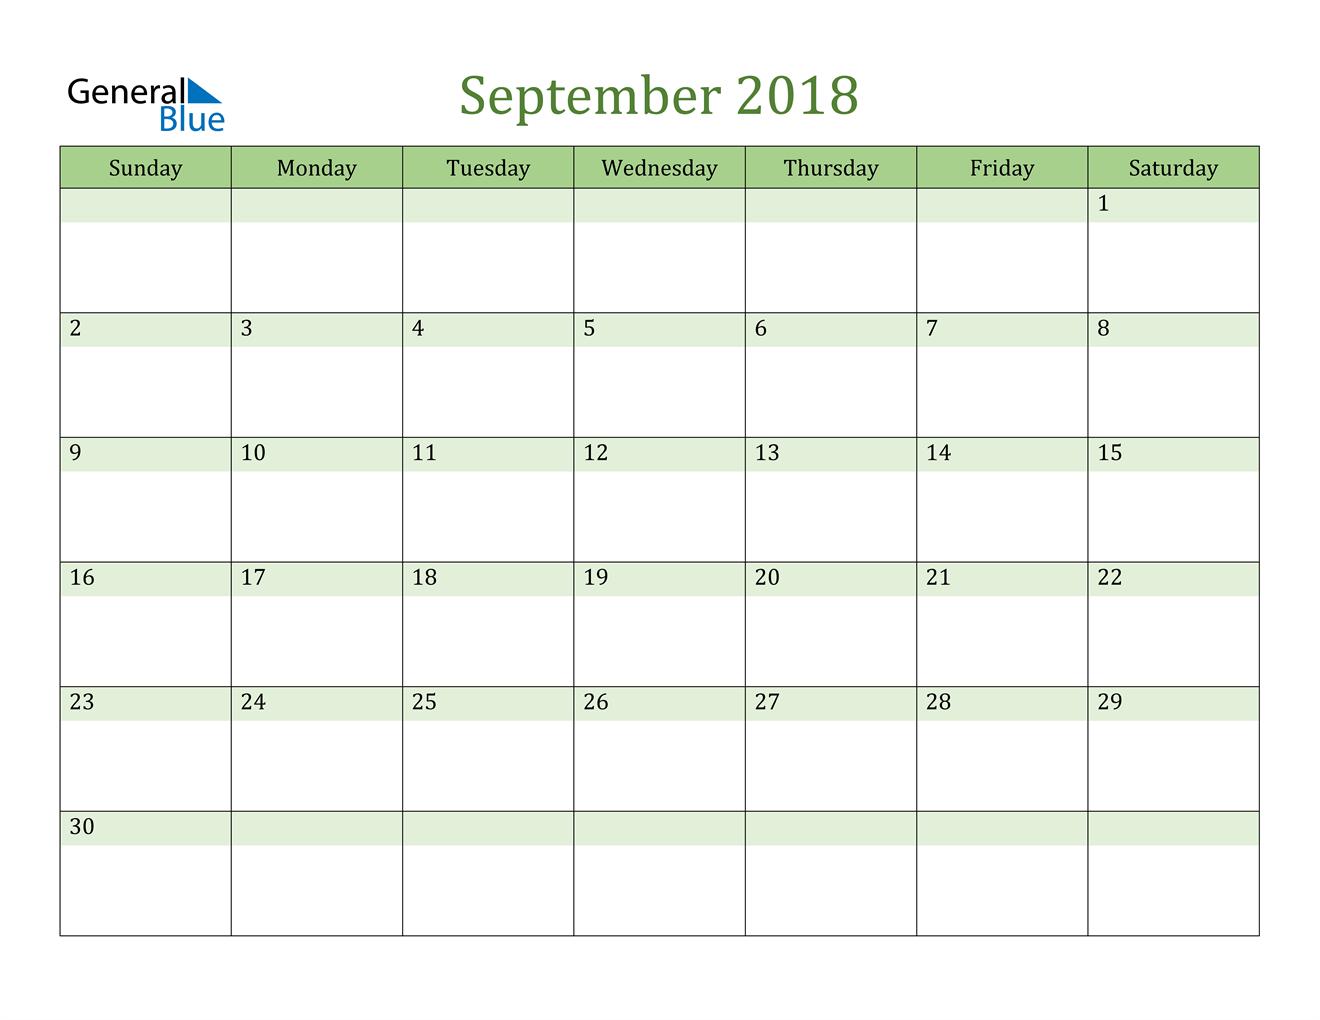 Image of September 2018 Cool and Relaxing Green Calendar Calendar